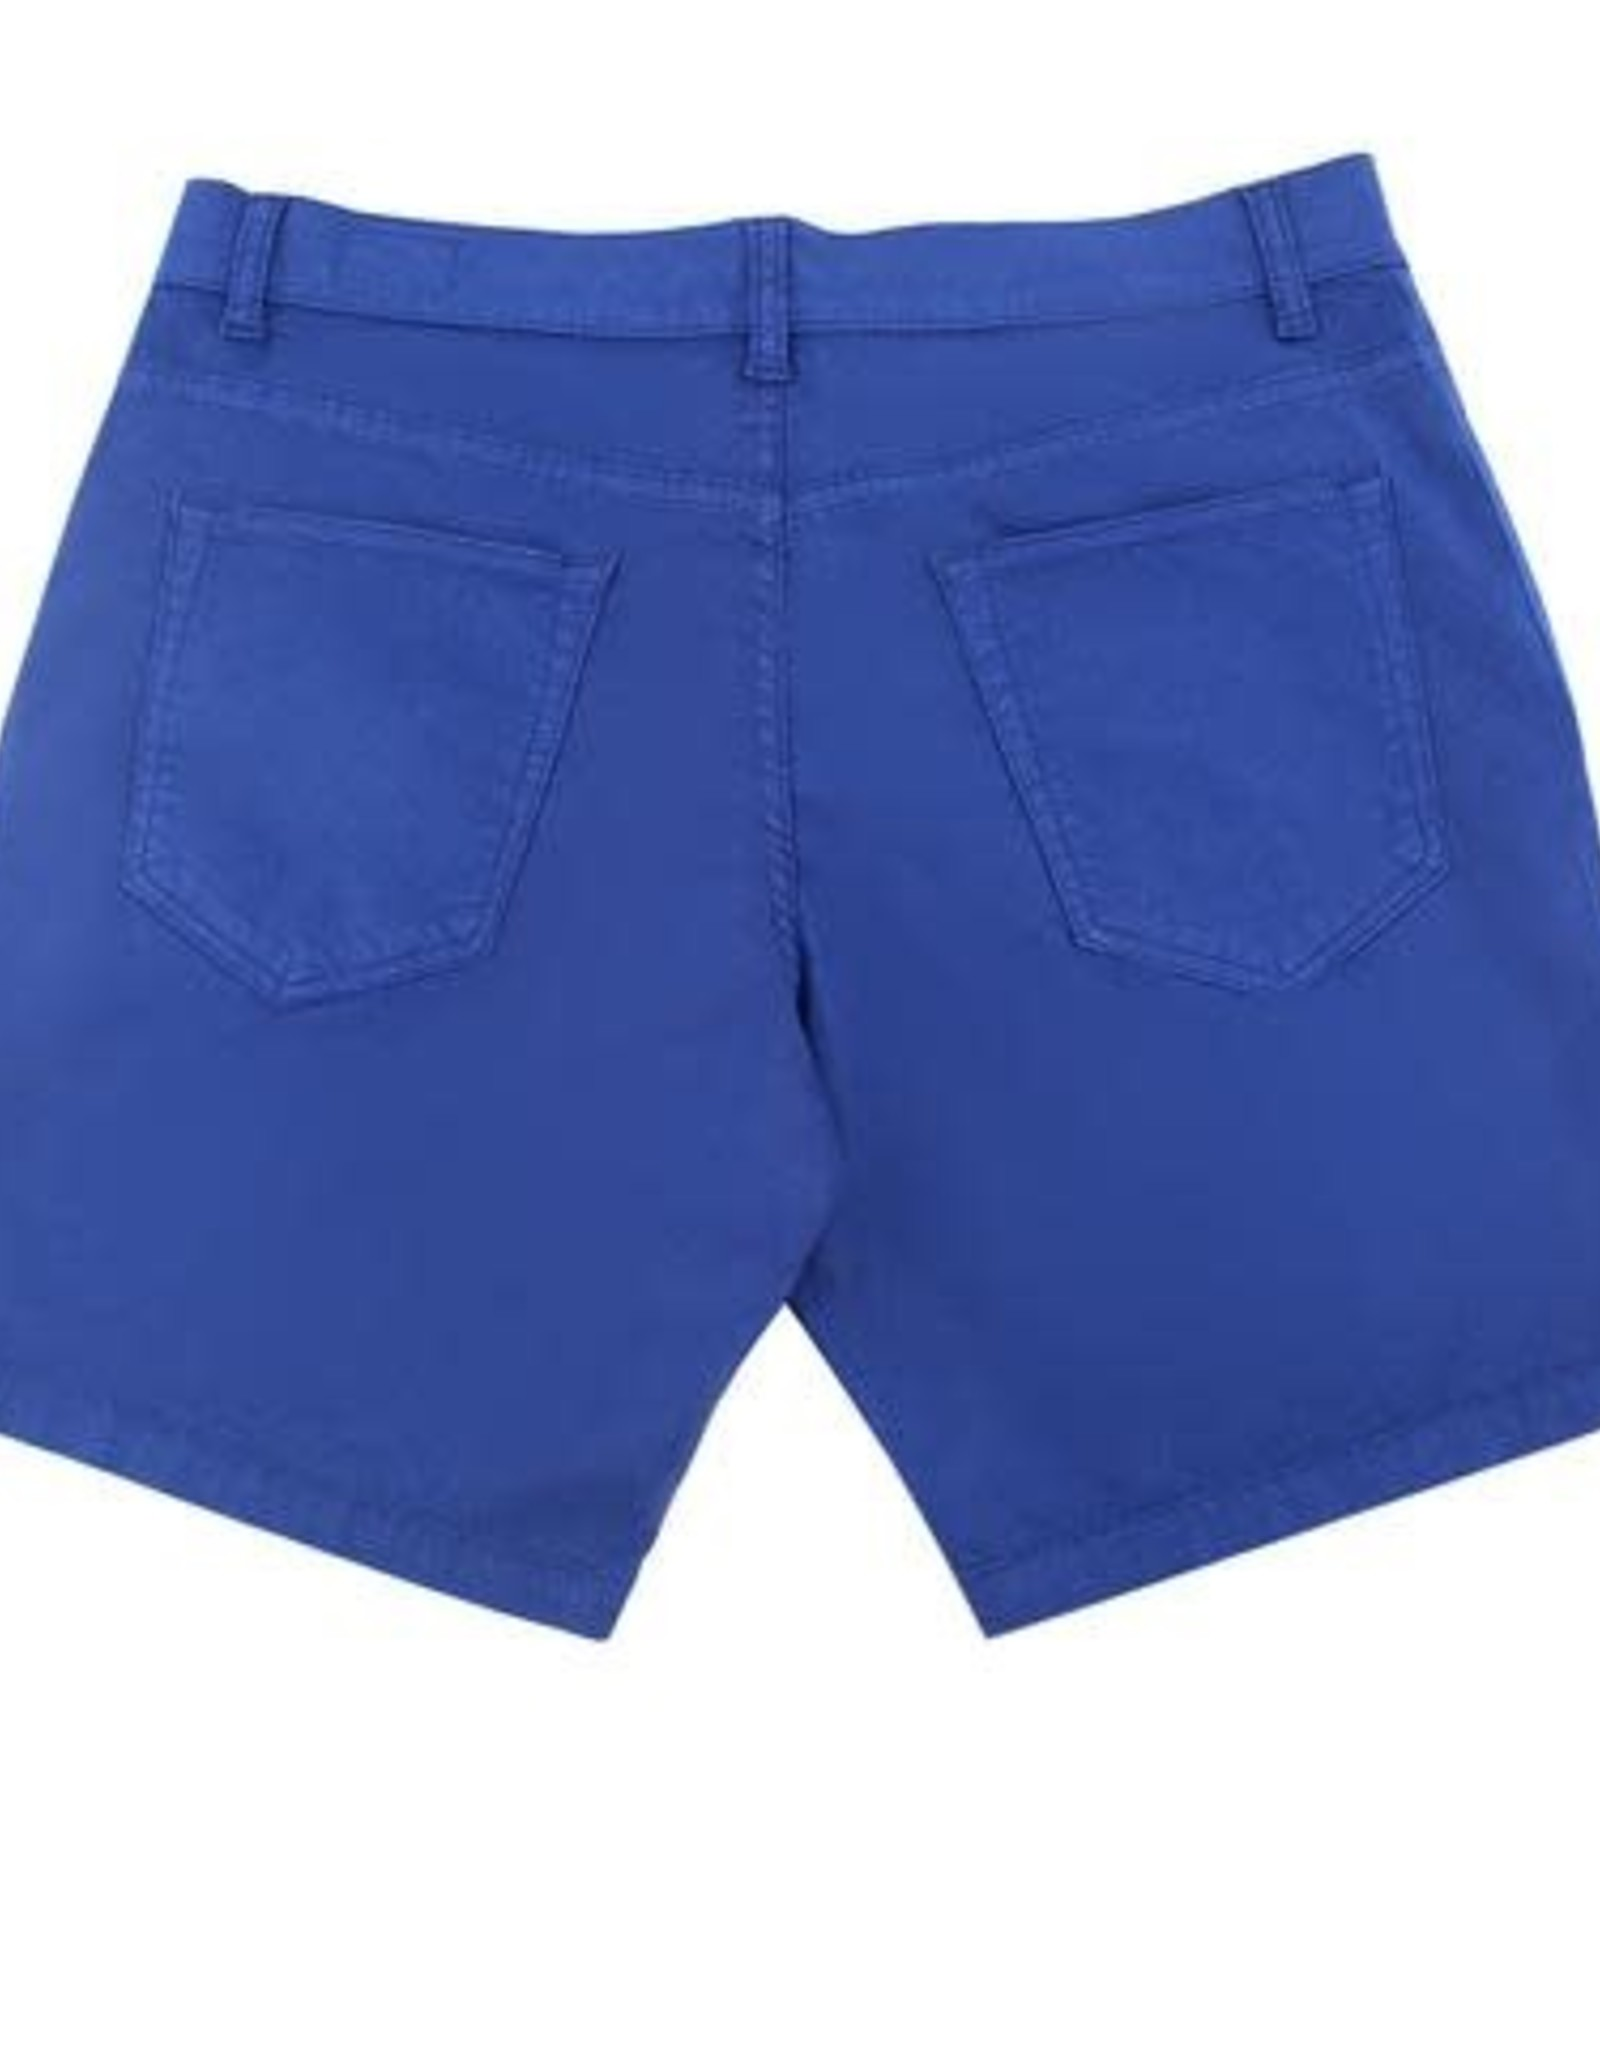 Eight X Slim Fit Chino Shorts